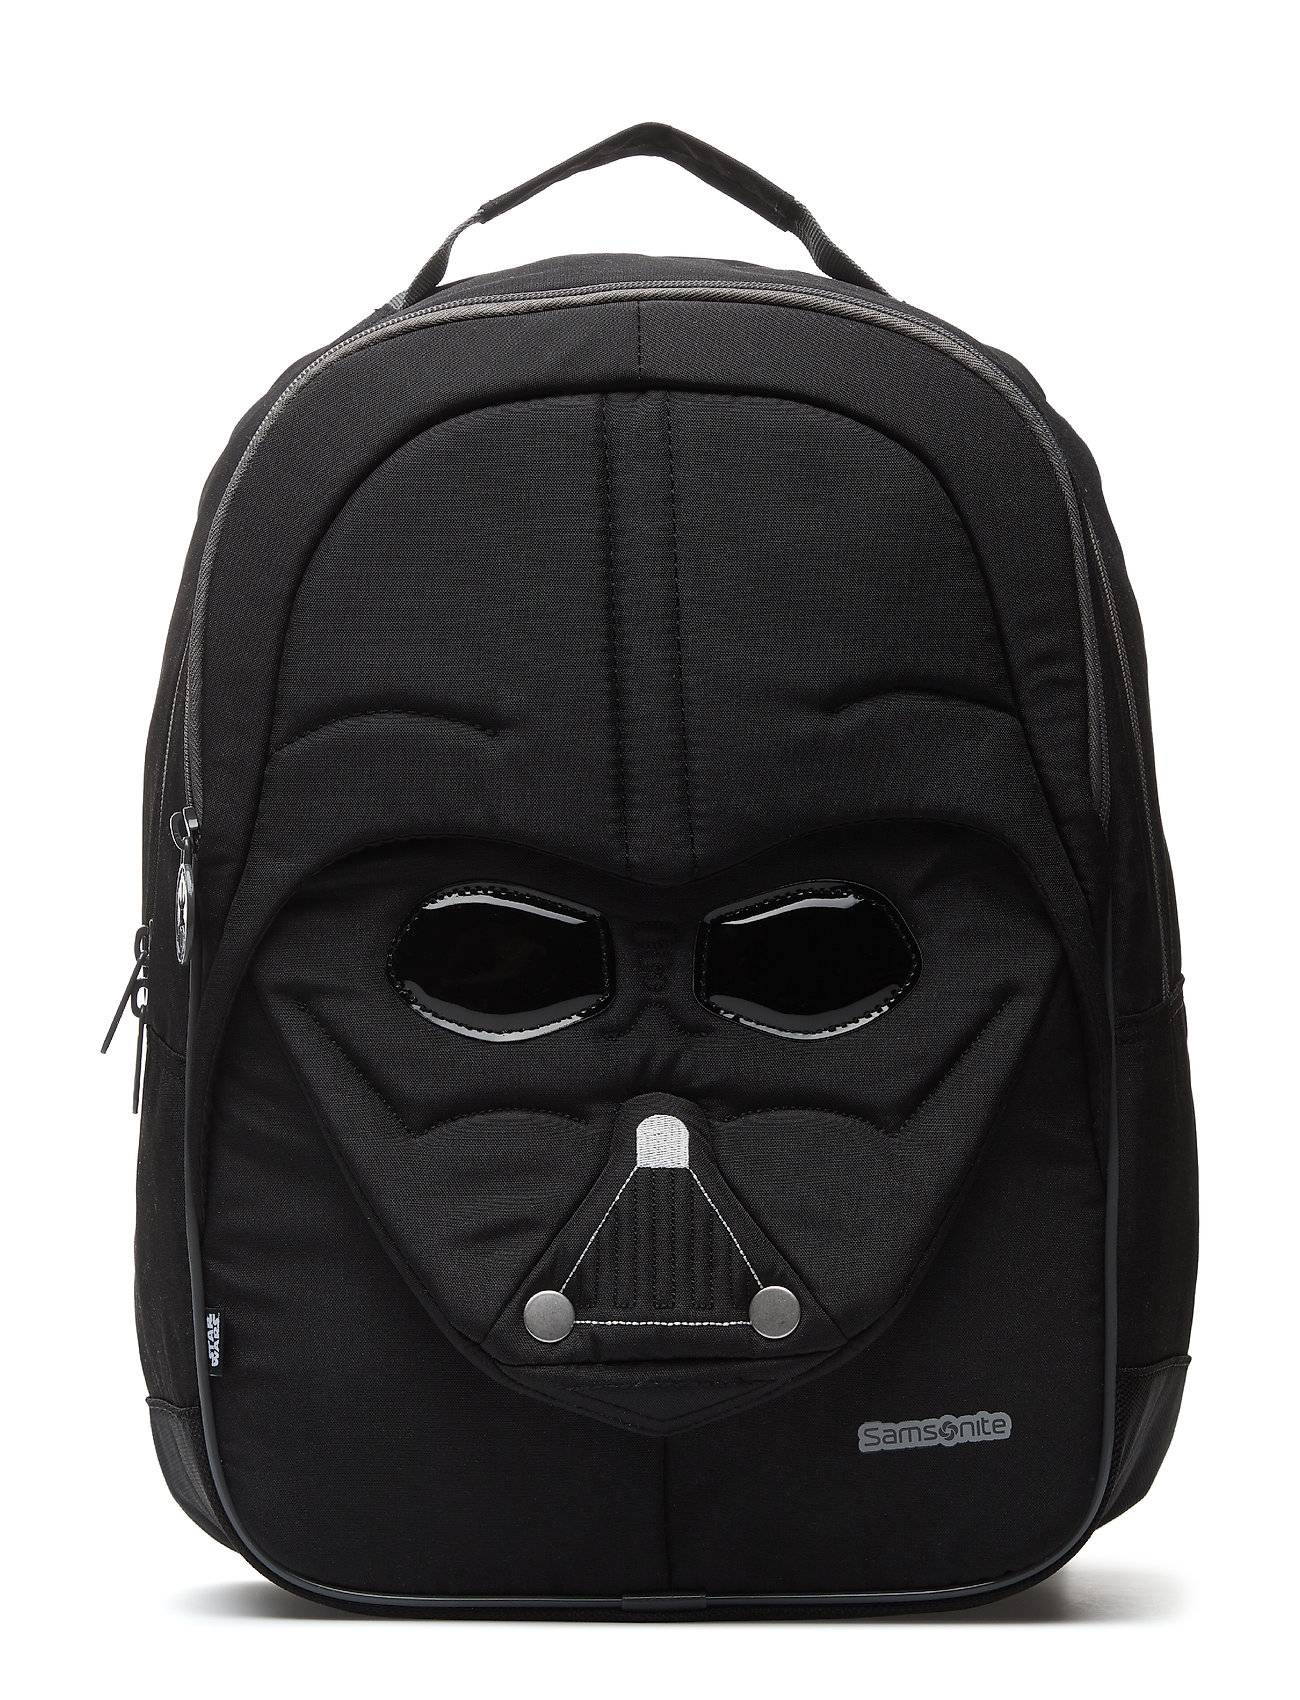 Samsonite Star Wars Backpack M